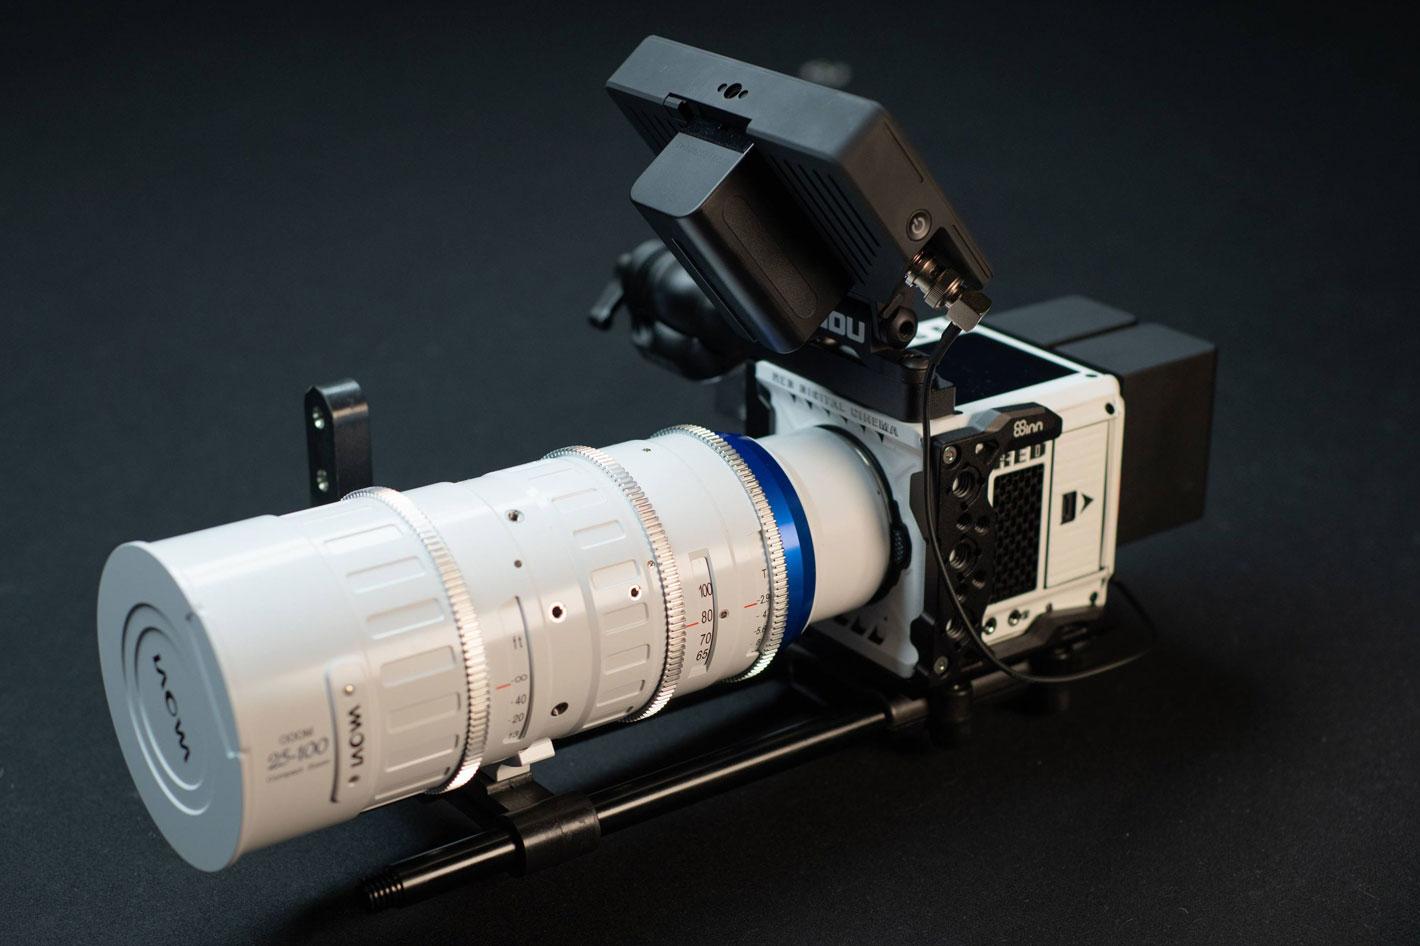 Laowa has two new Piano White Cine lenses